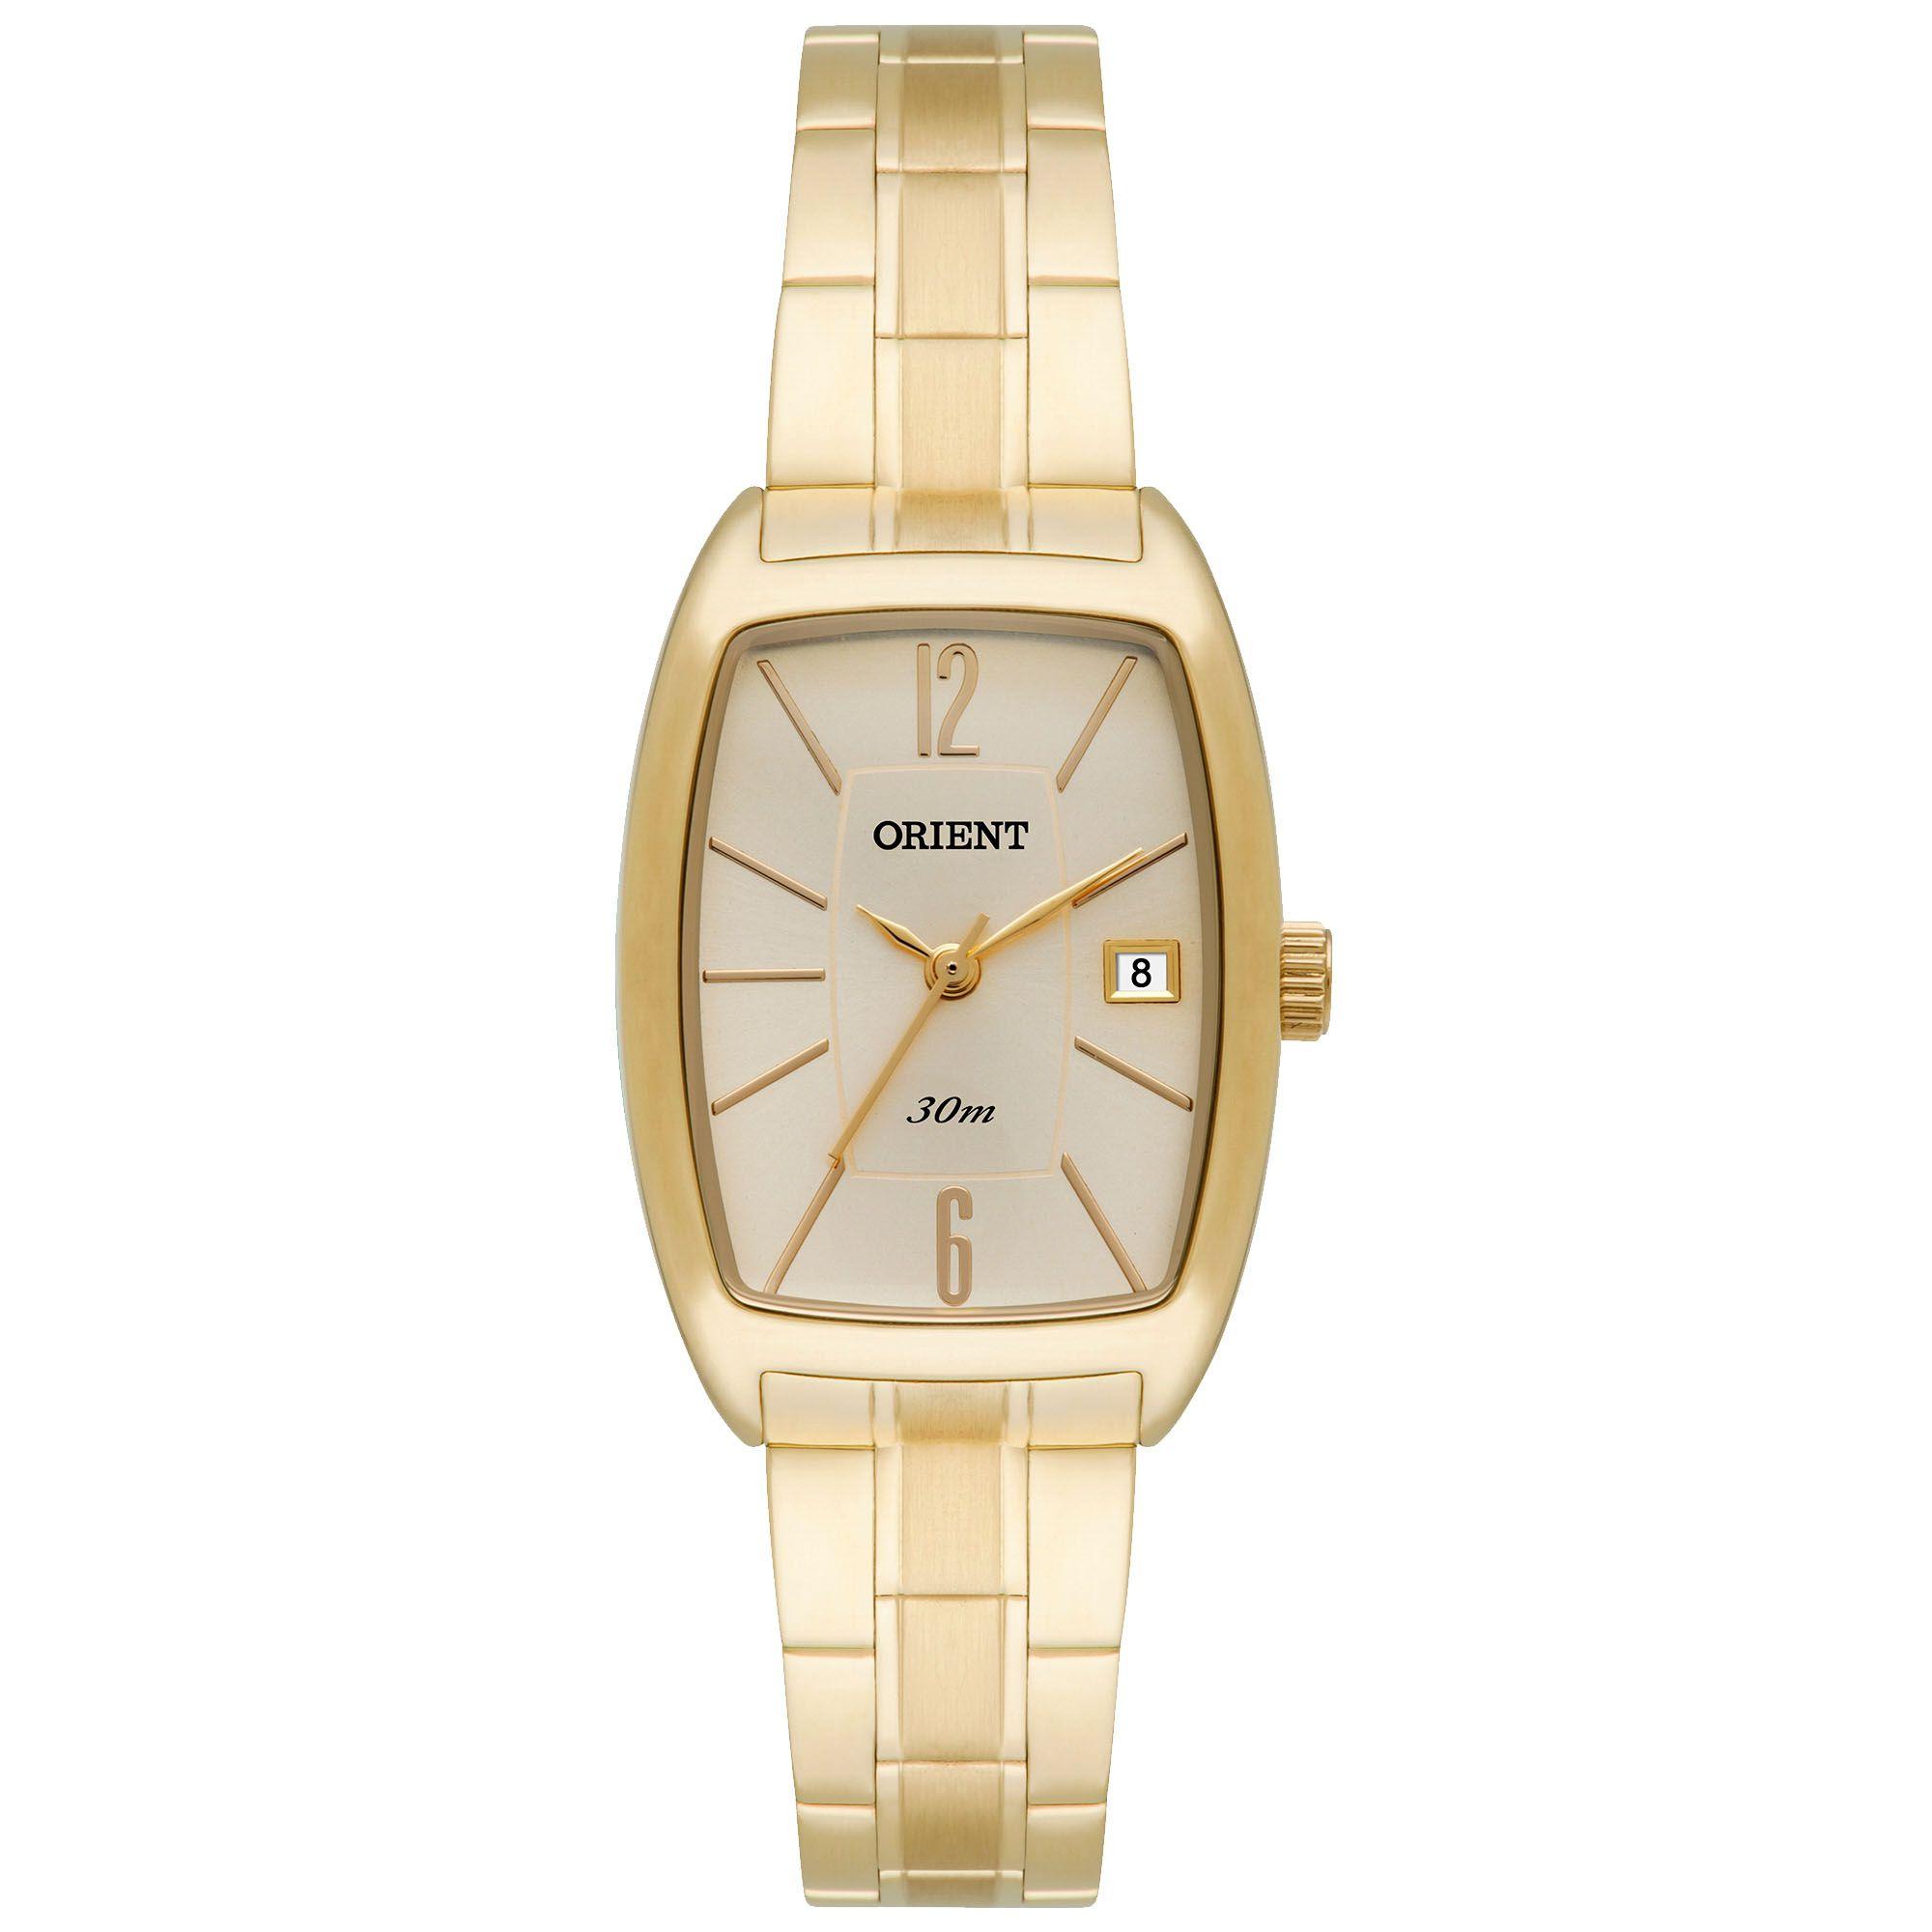 Relógio Feminino Orient LGSS1013 C2KX